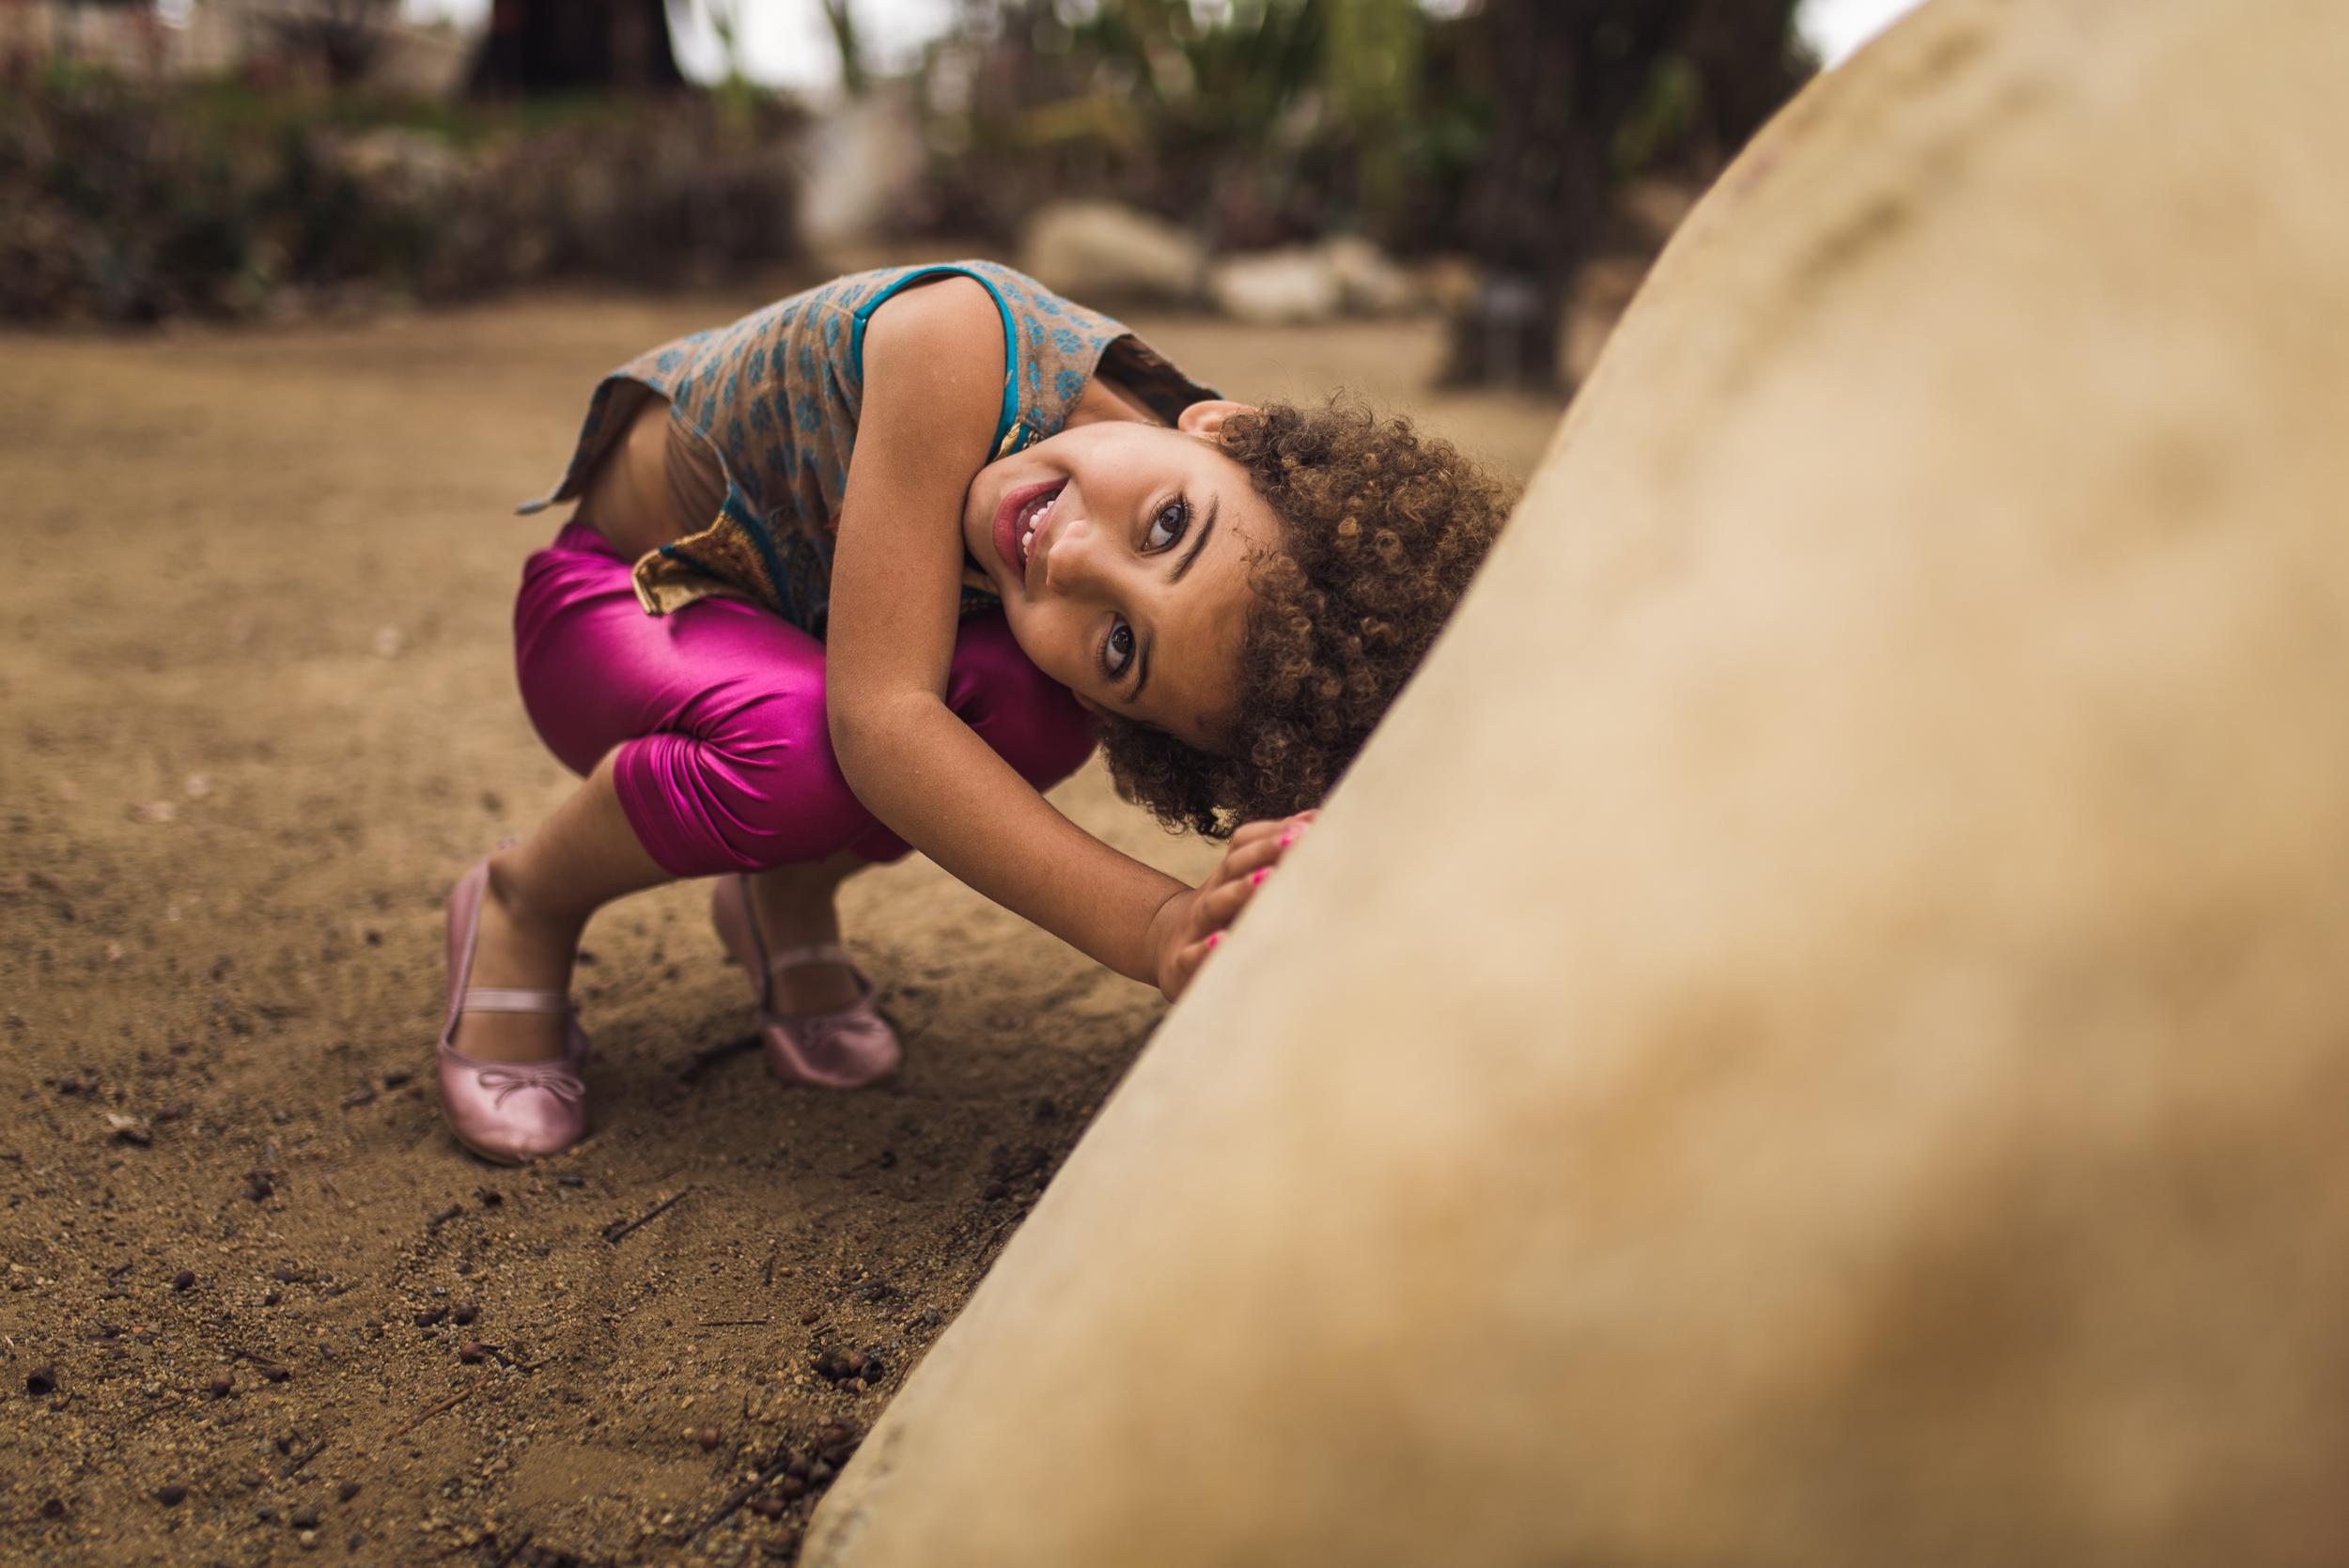 2018-San-Diego-Family-Lifestyle-Newborn-Travel-Vacation-Photographer-Kelsey-Smith-Photography-Coronado-La-Jolla-Encinitas-Solana-Beach-Del-Mar-41.jpg